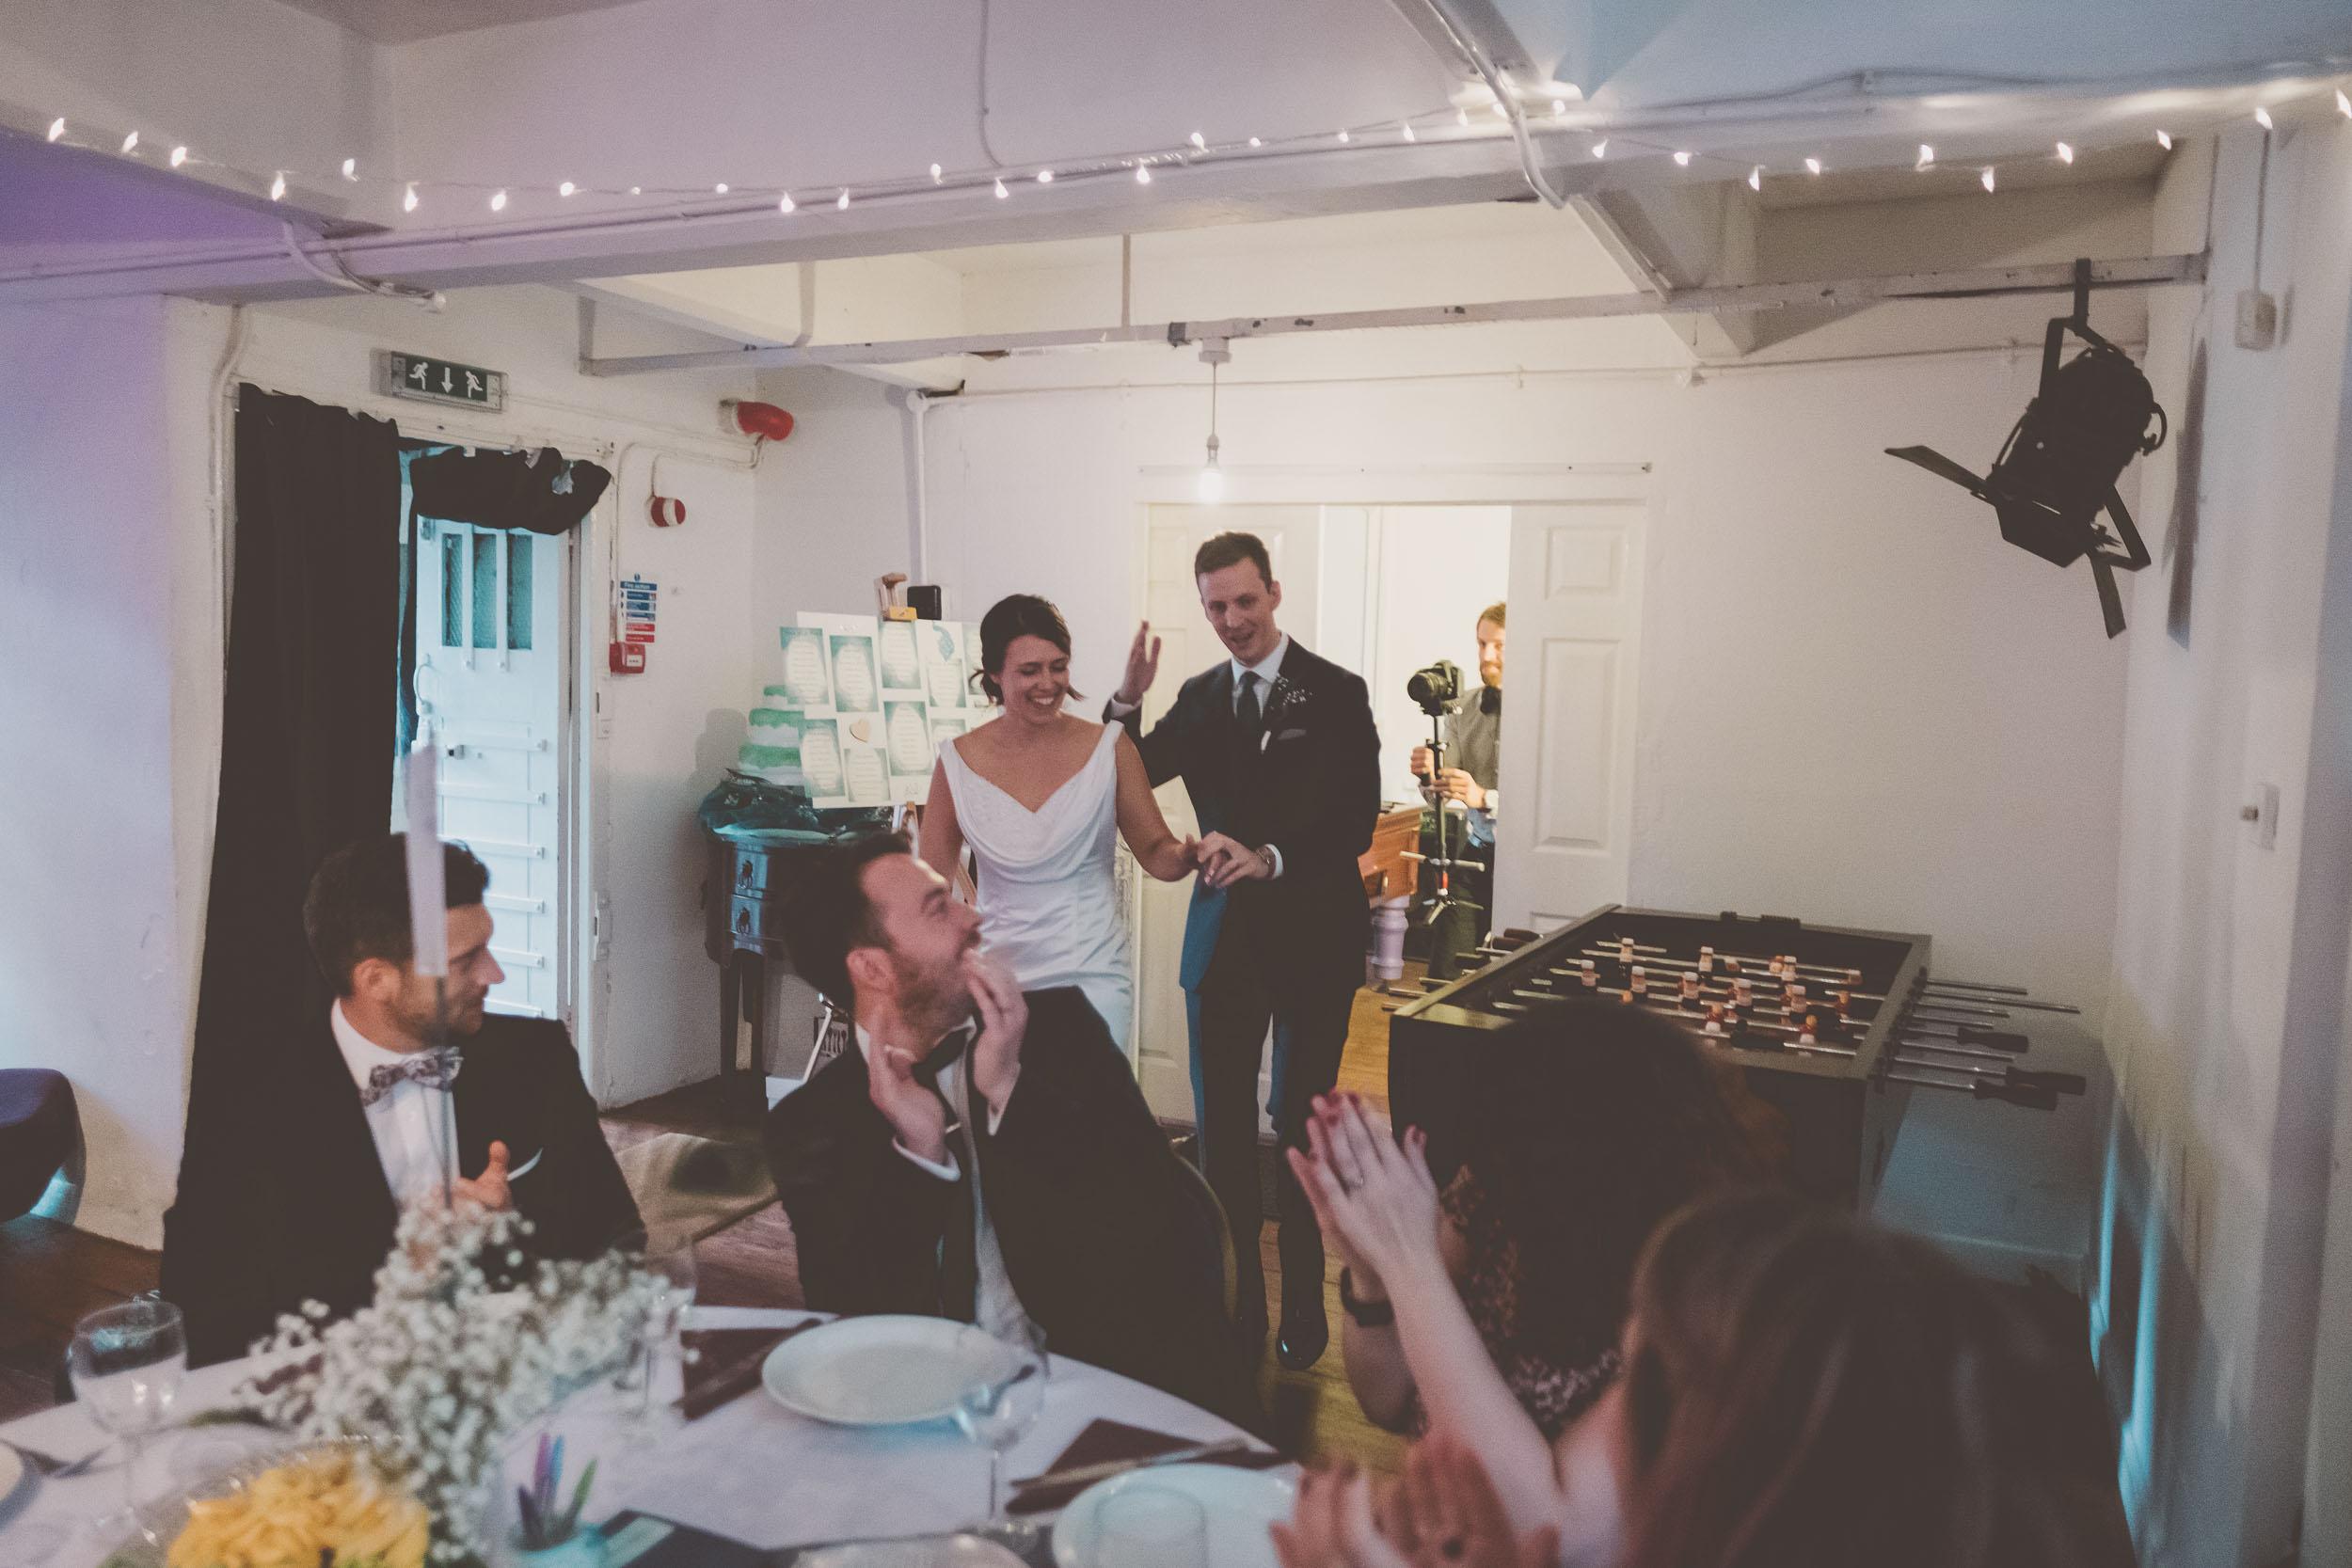 islington-town-hall-4th-floor-studios-wedding342.jpg